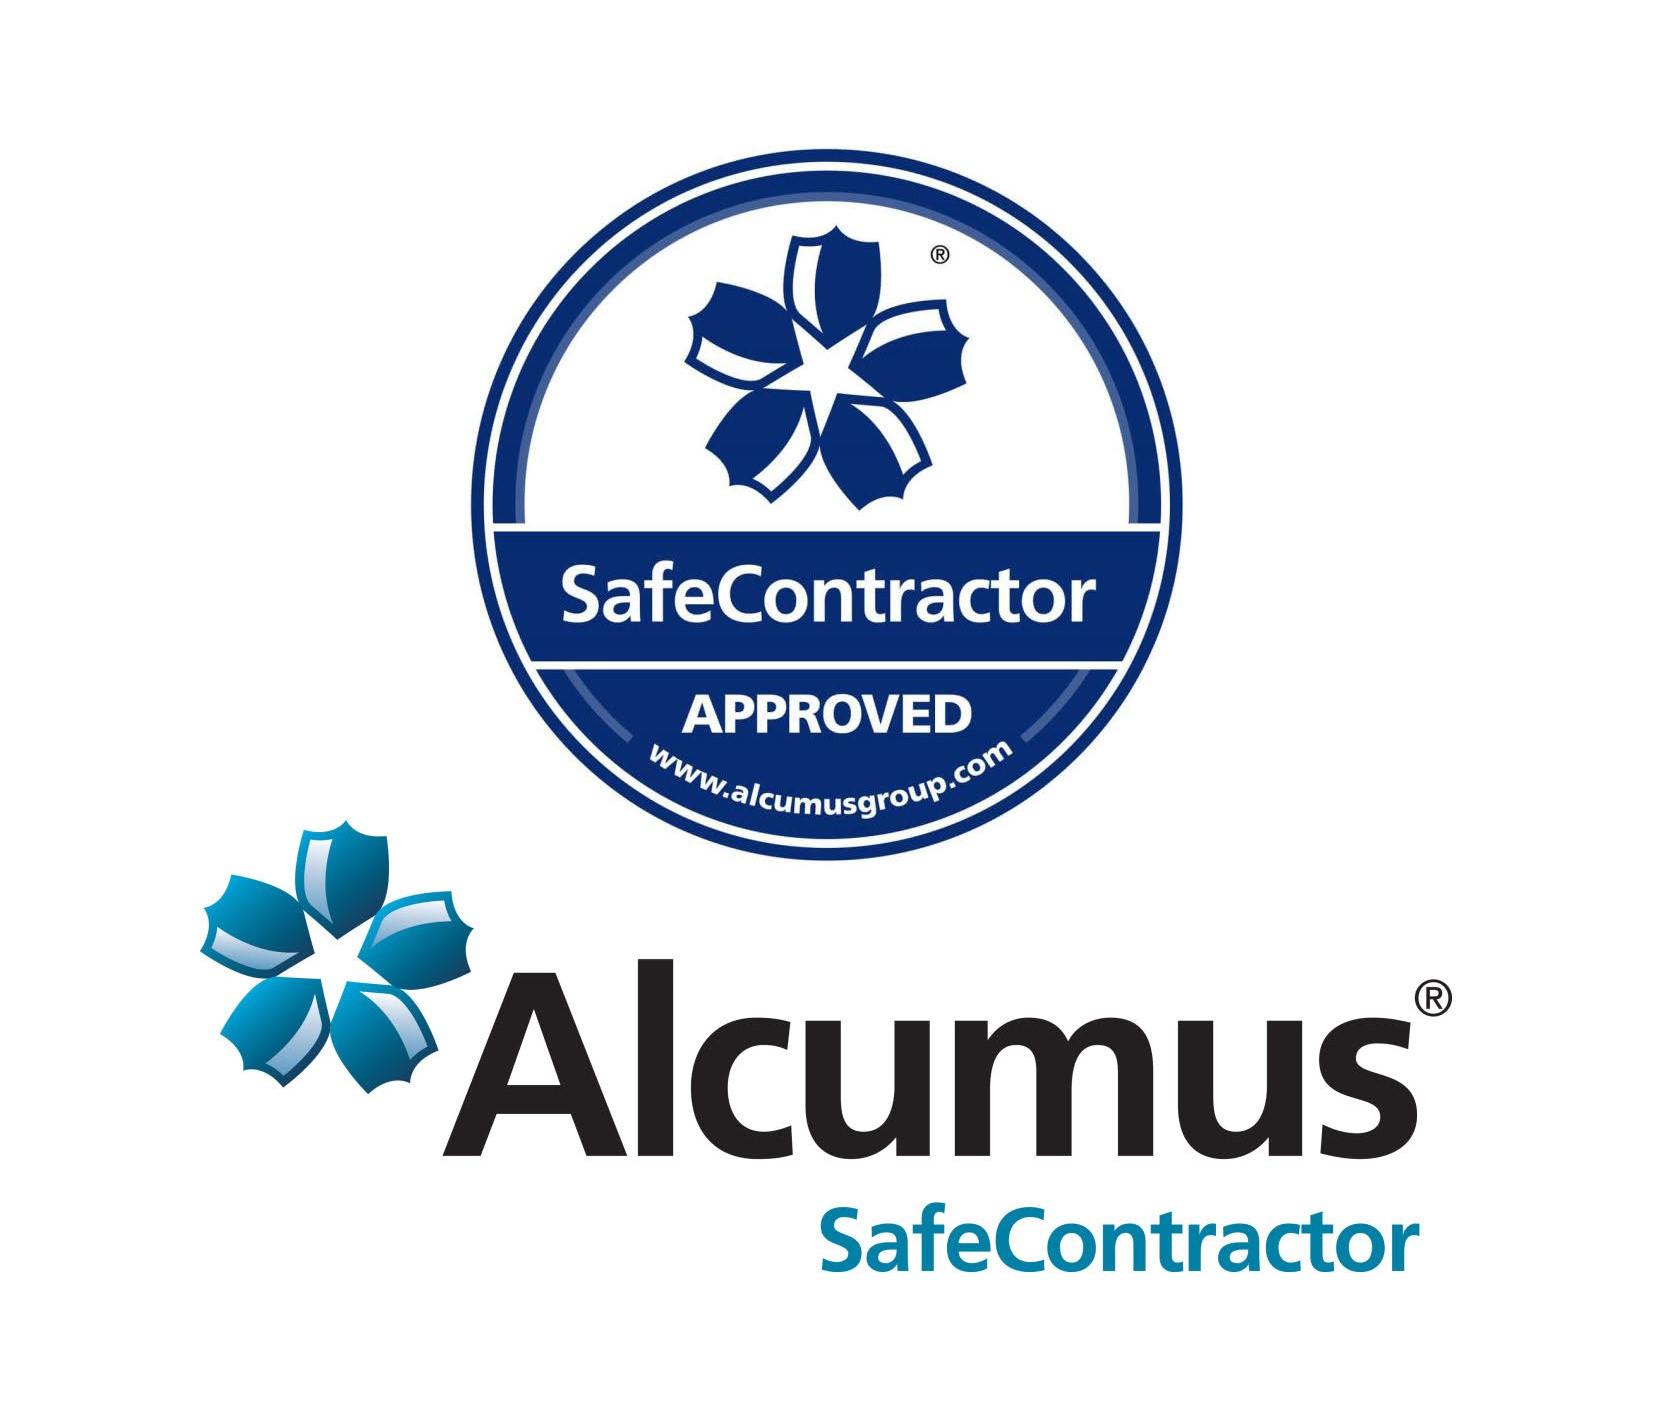 alcumus-safecontractor-vietec